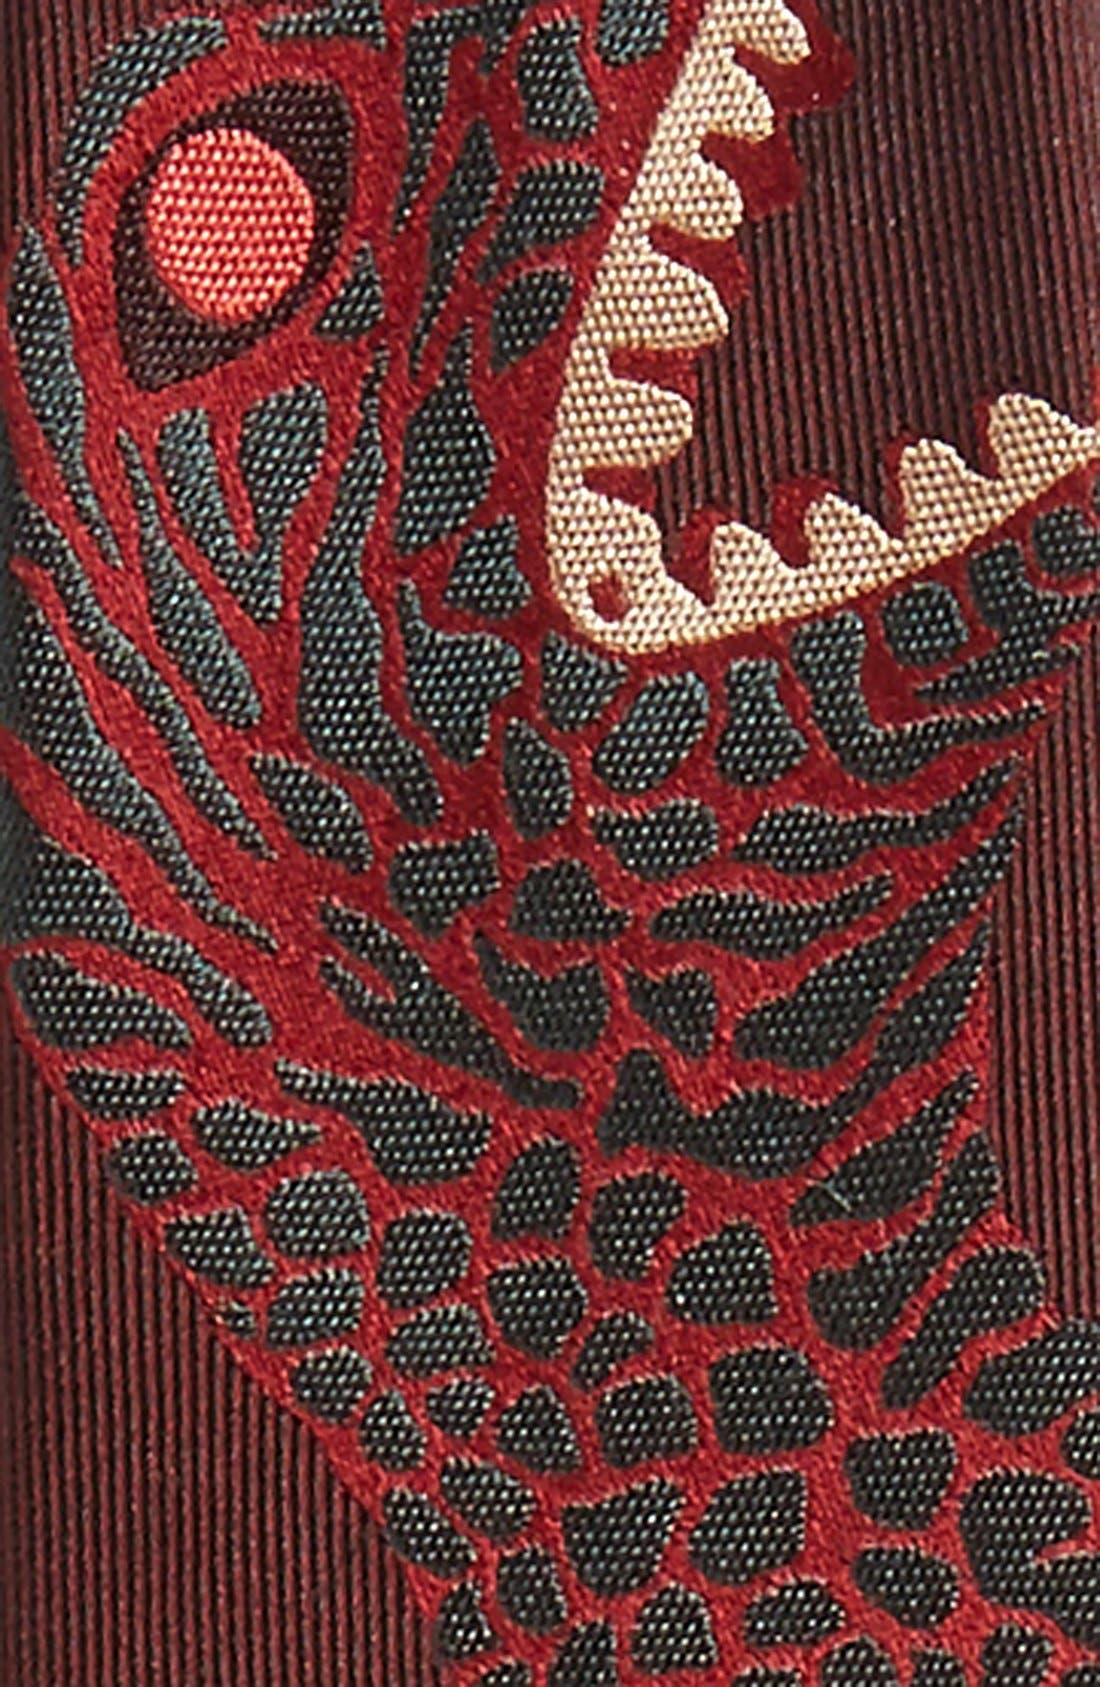 'Dinosaur' Silk Skinny Tie,                             Alternate thumbnail 4, color,                             200